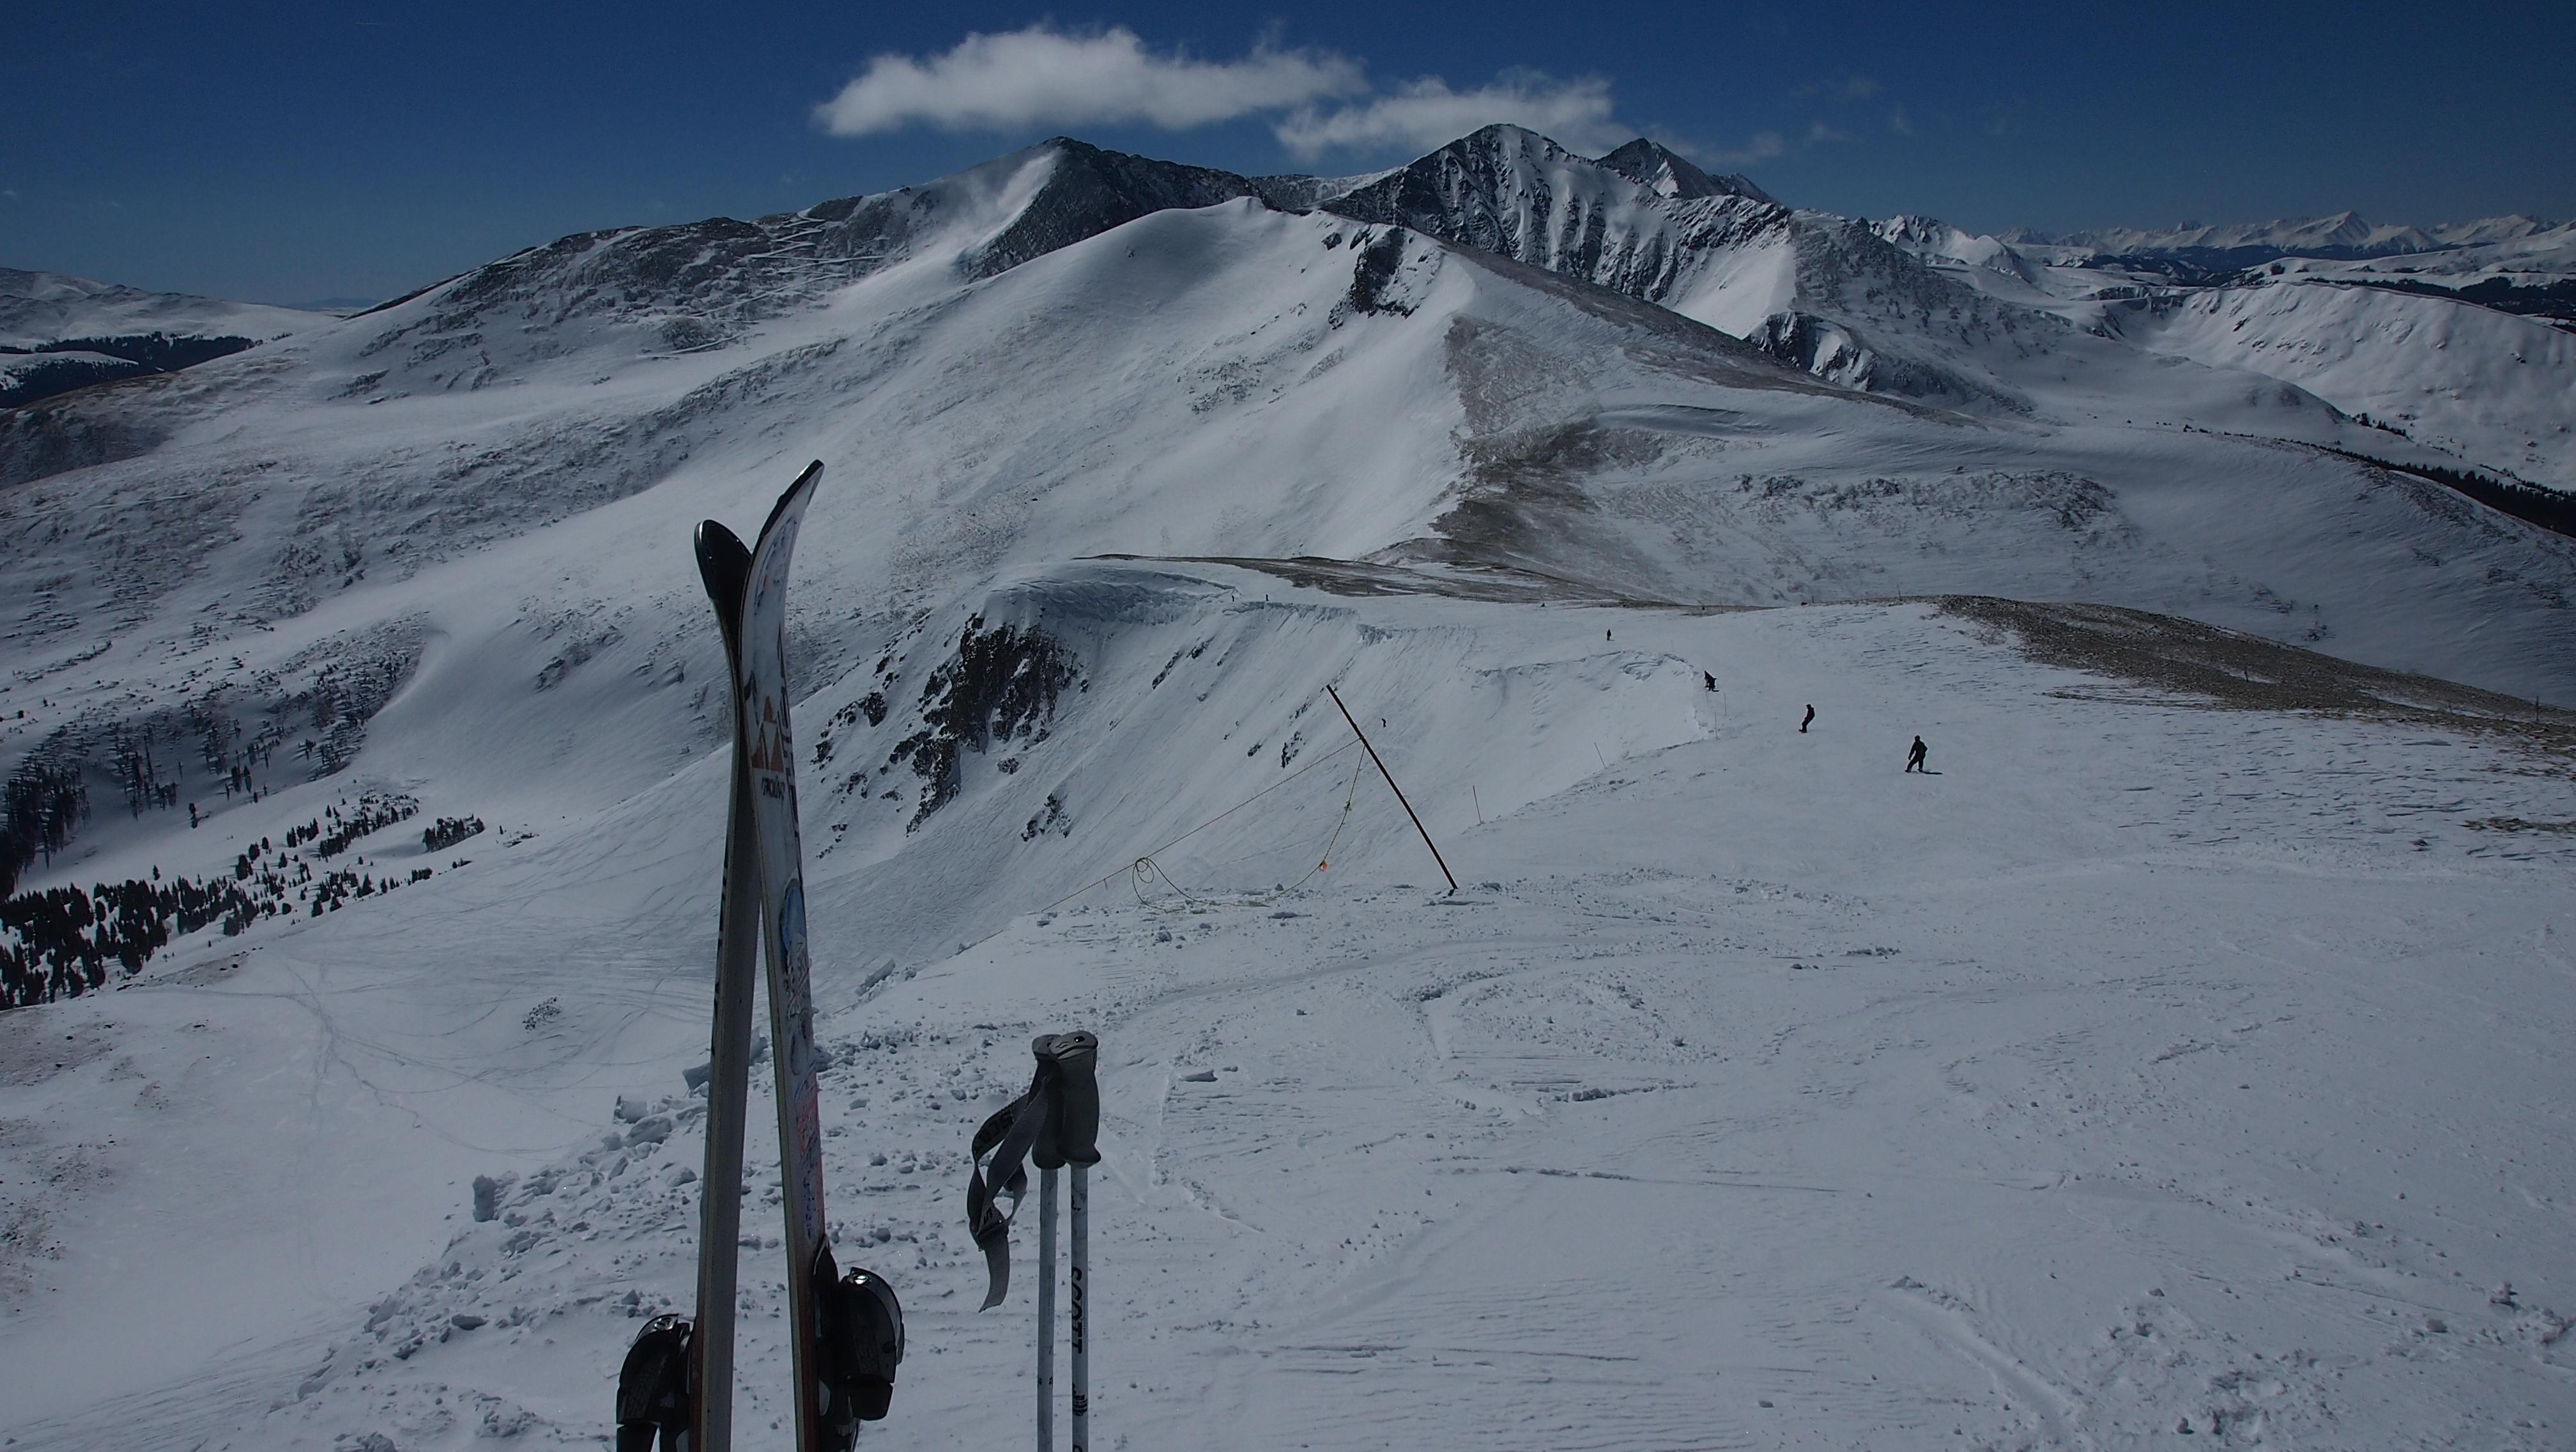 Peak 8, Breckenridge